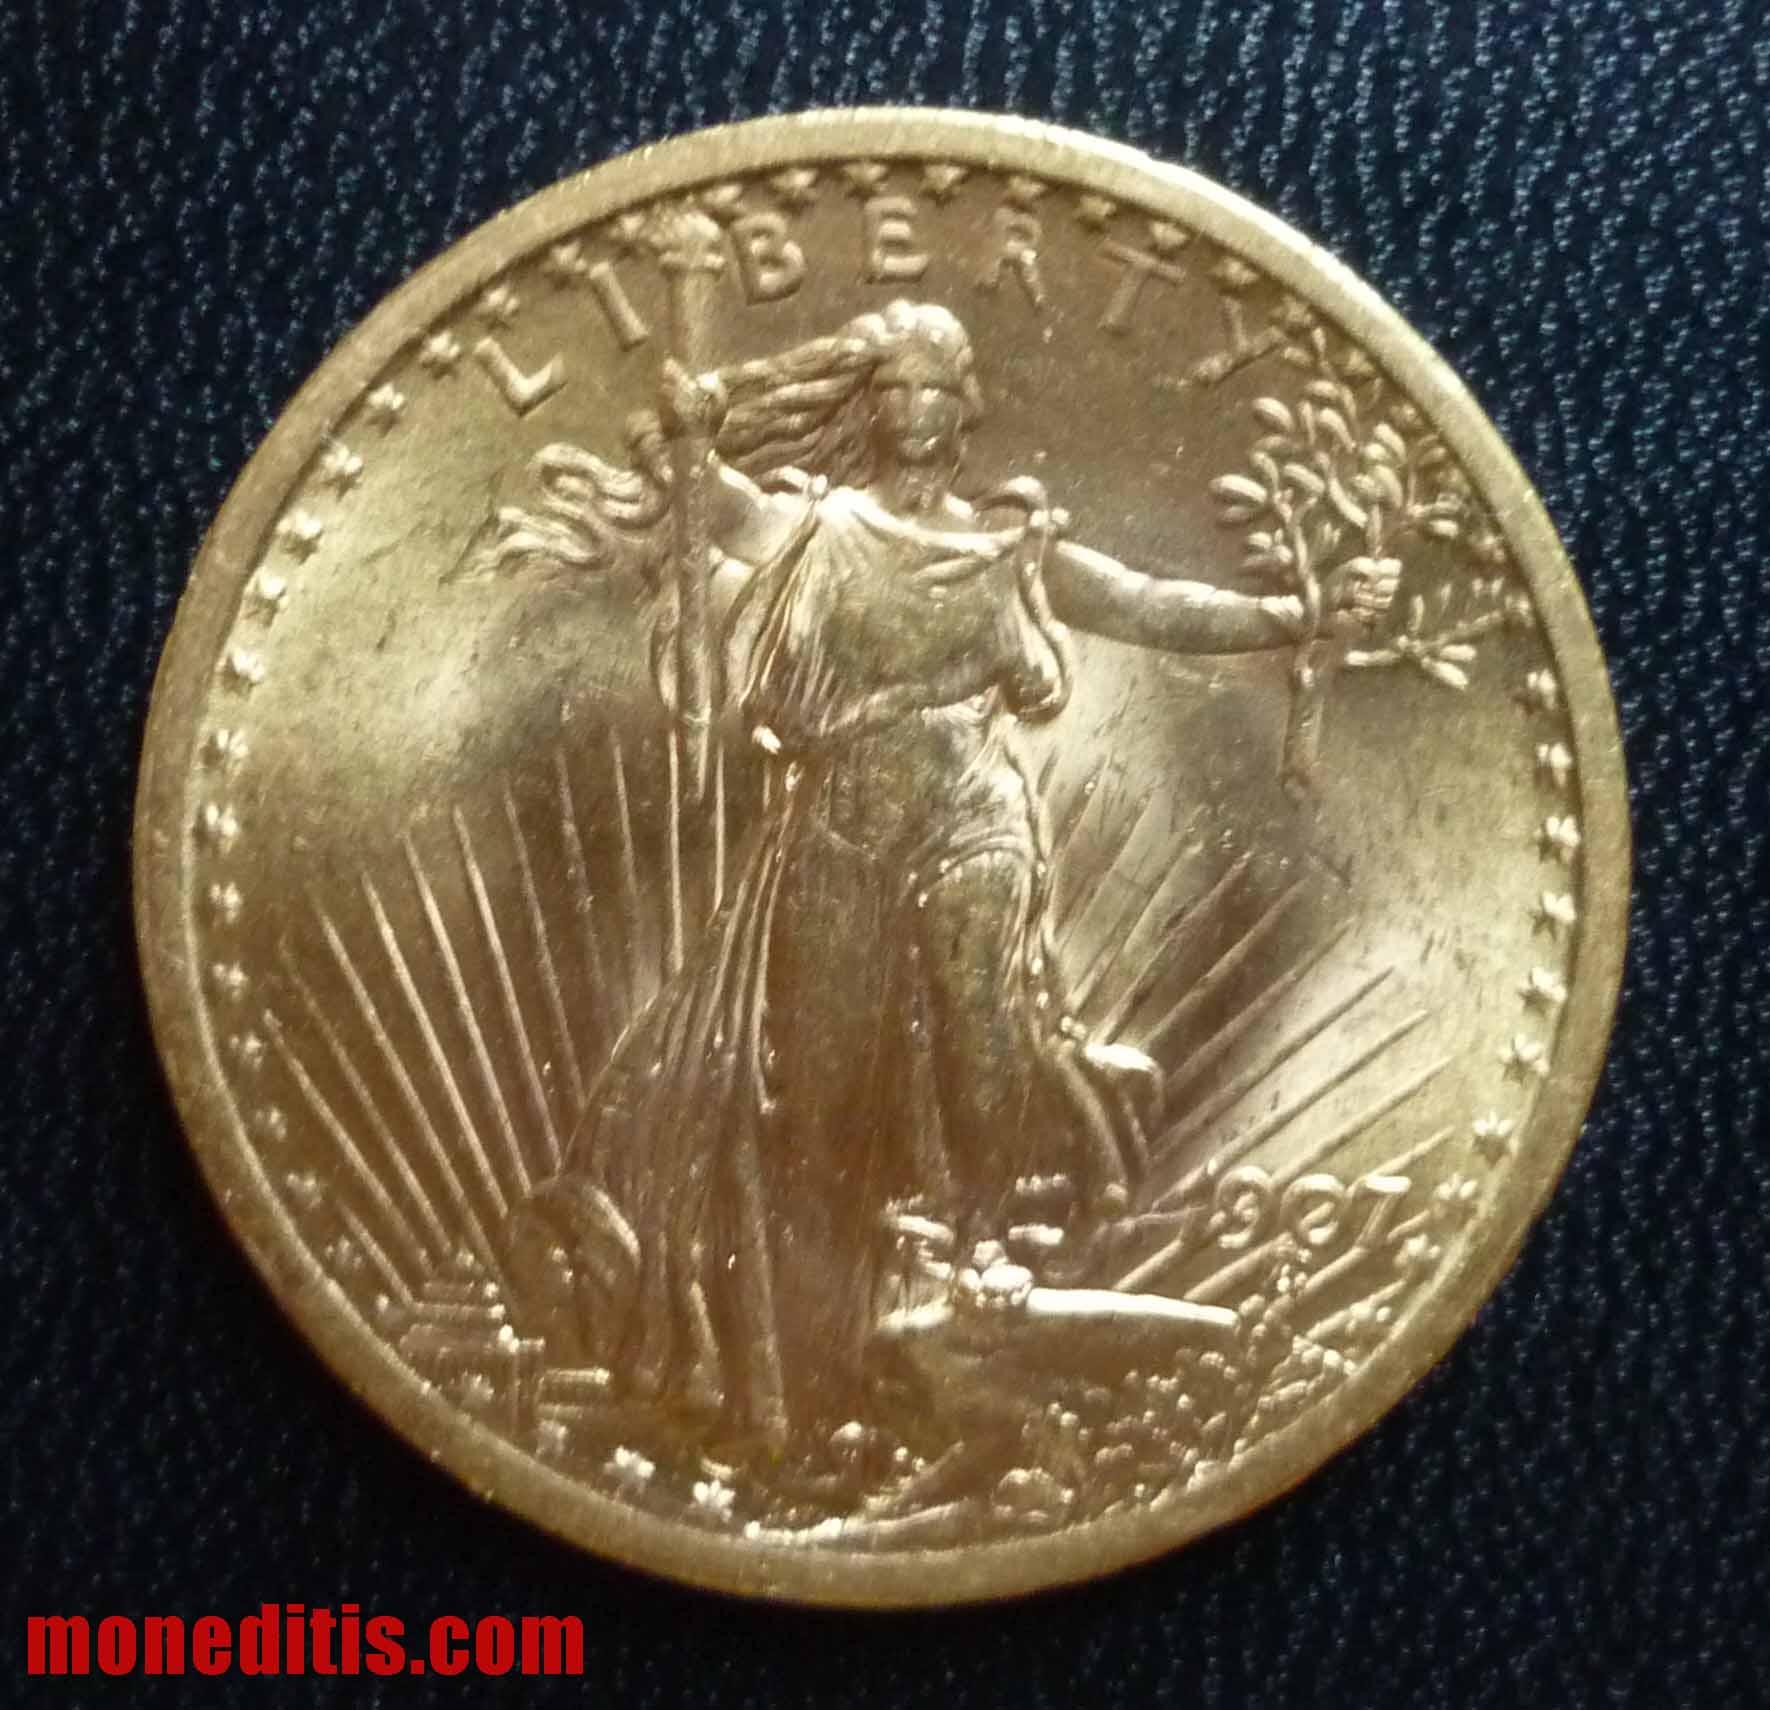 1907 20 $ double eagle St. Gaudens 18